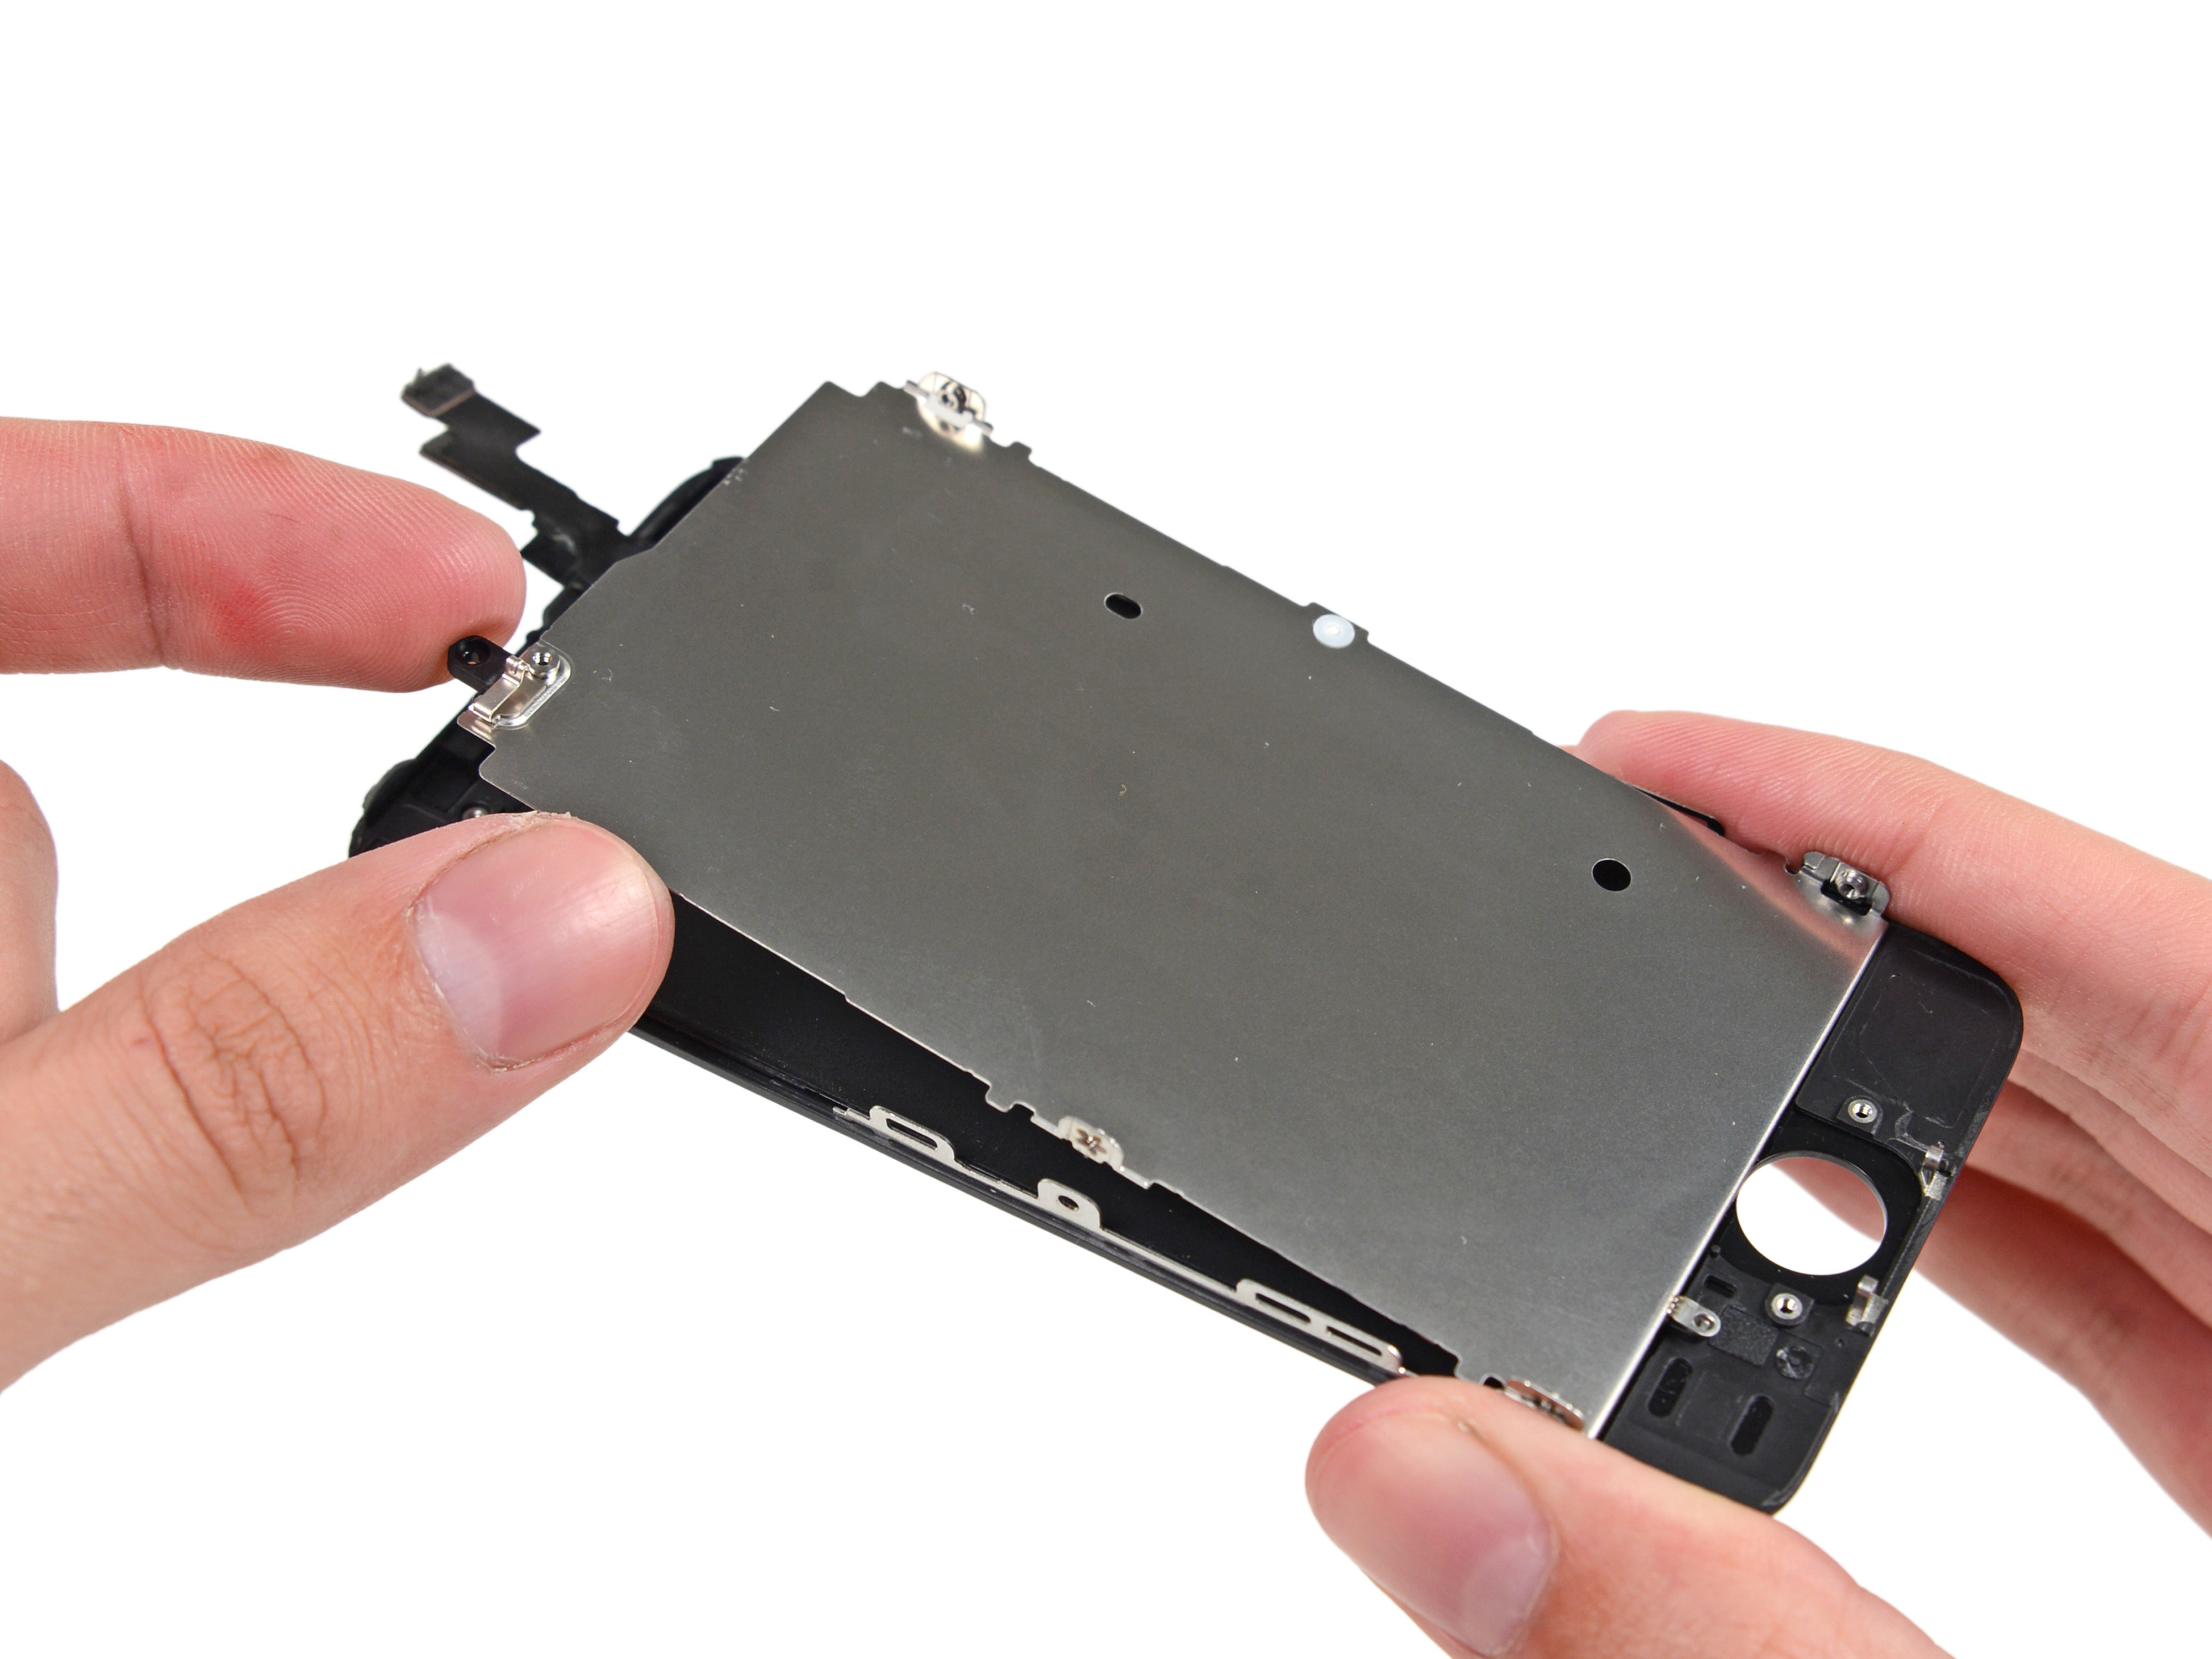 Ремонт iPhone 3G - фото 23 | Сервисный центр Total Apple